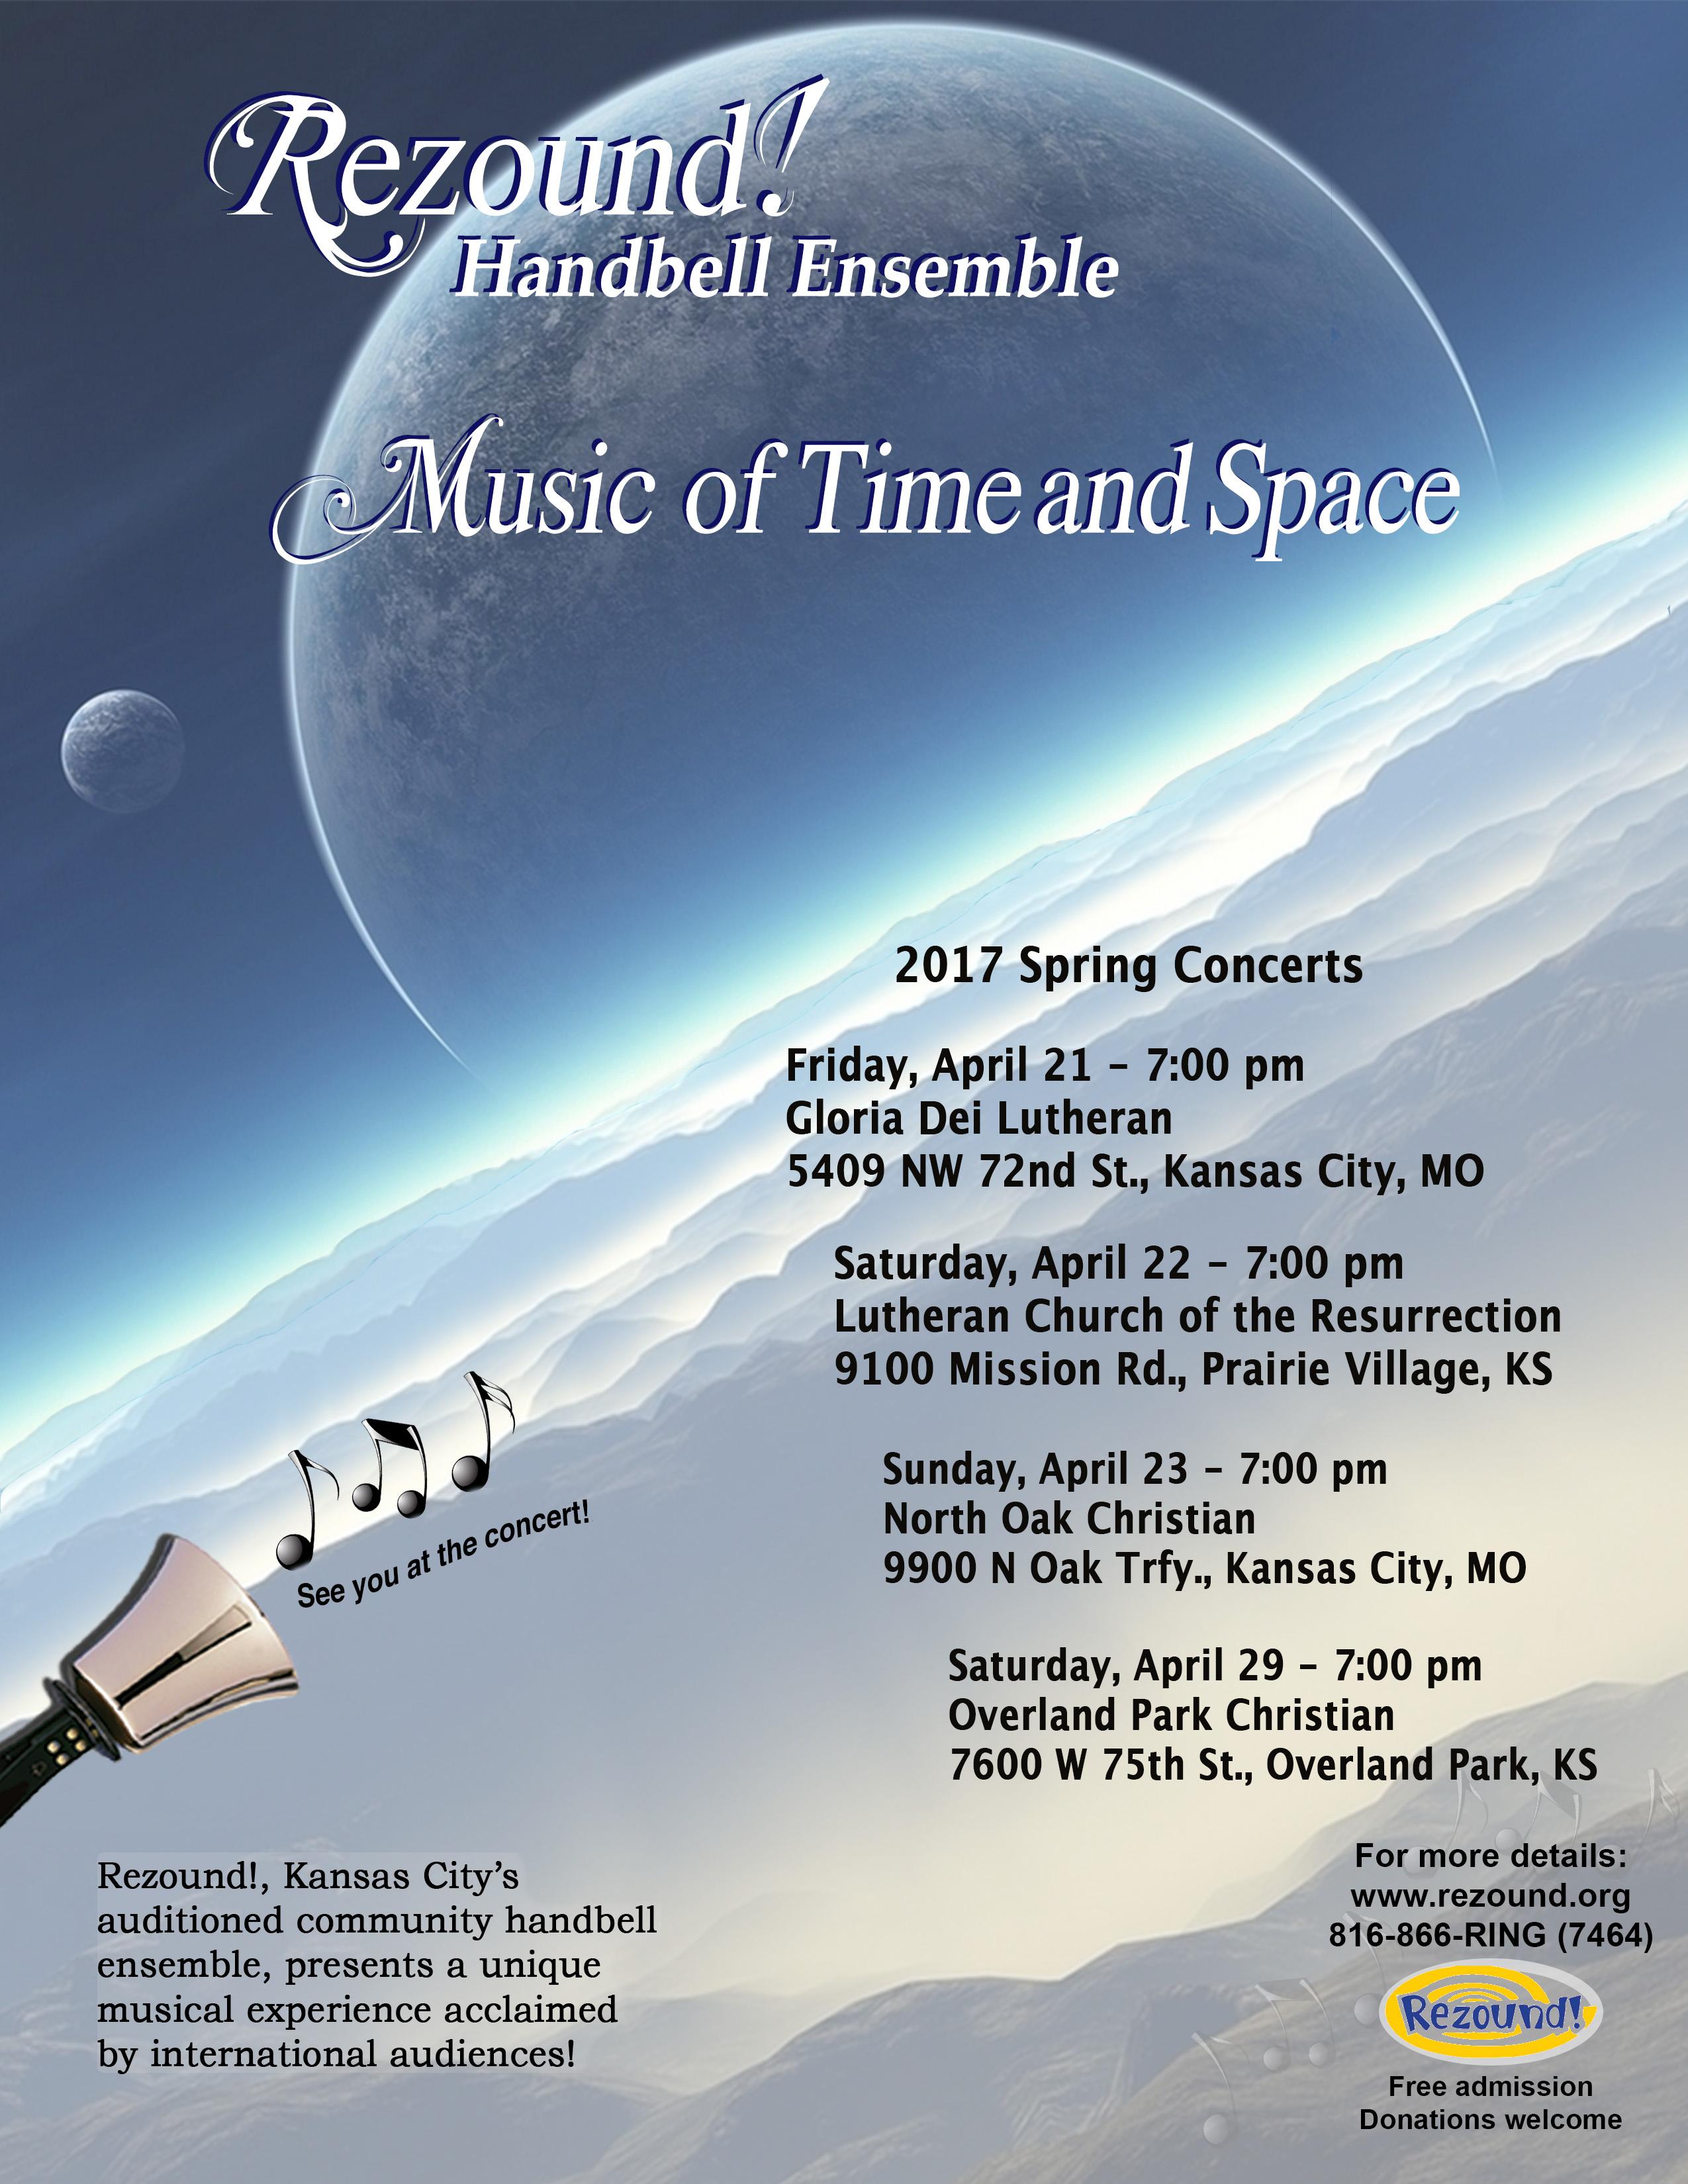 Kansas johnson county prairie village - Rezound Handbell Ensemble In Concert